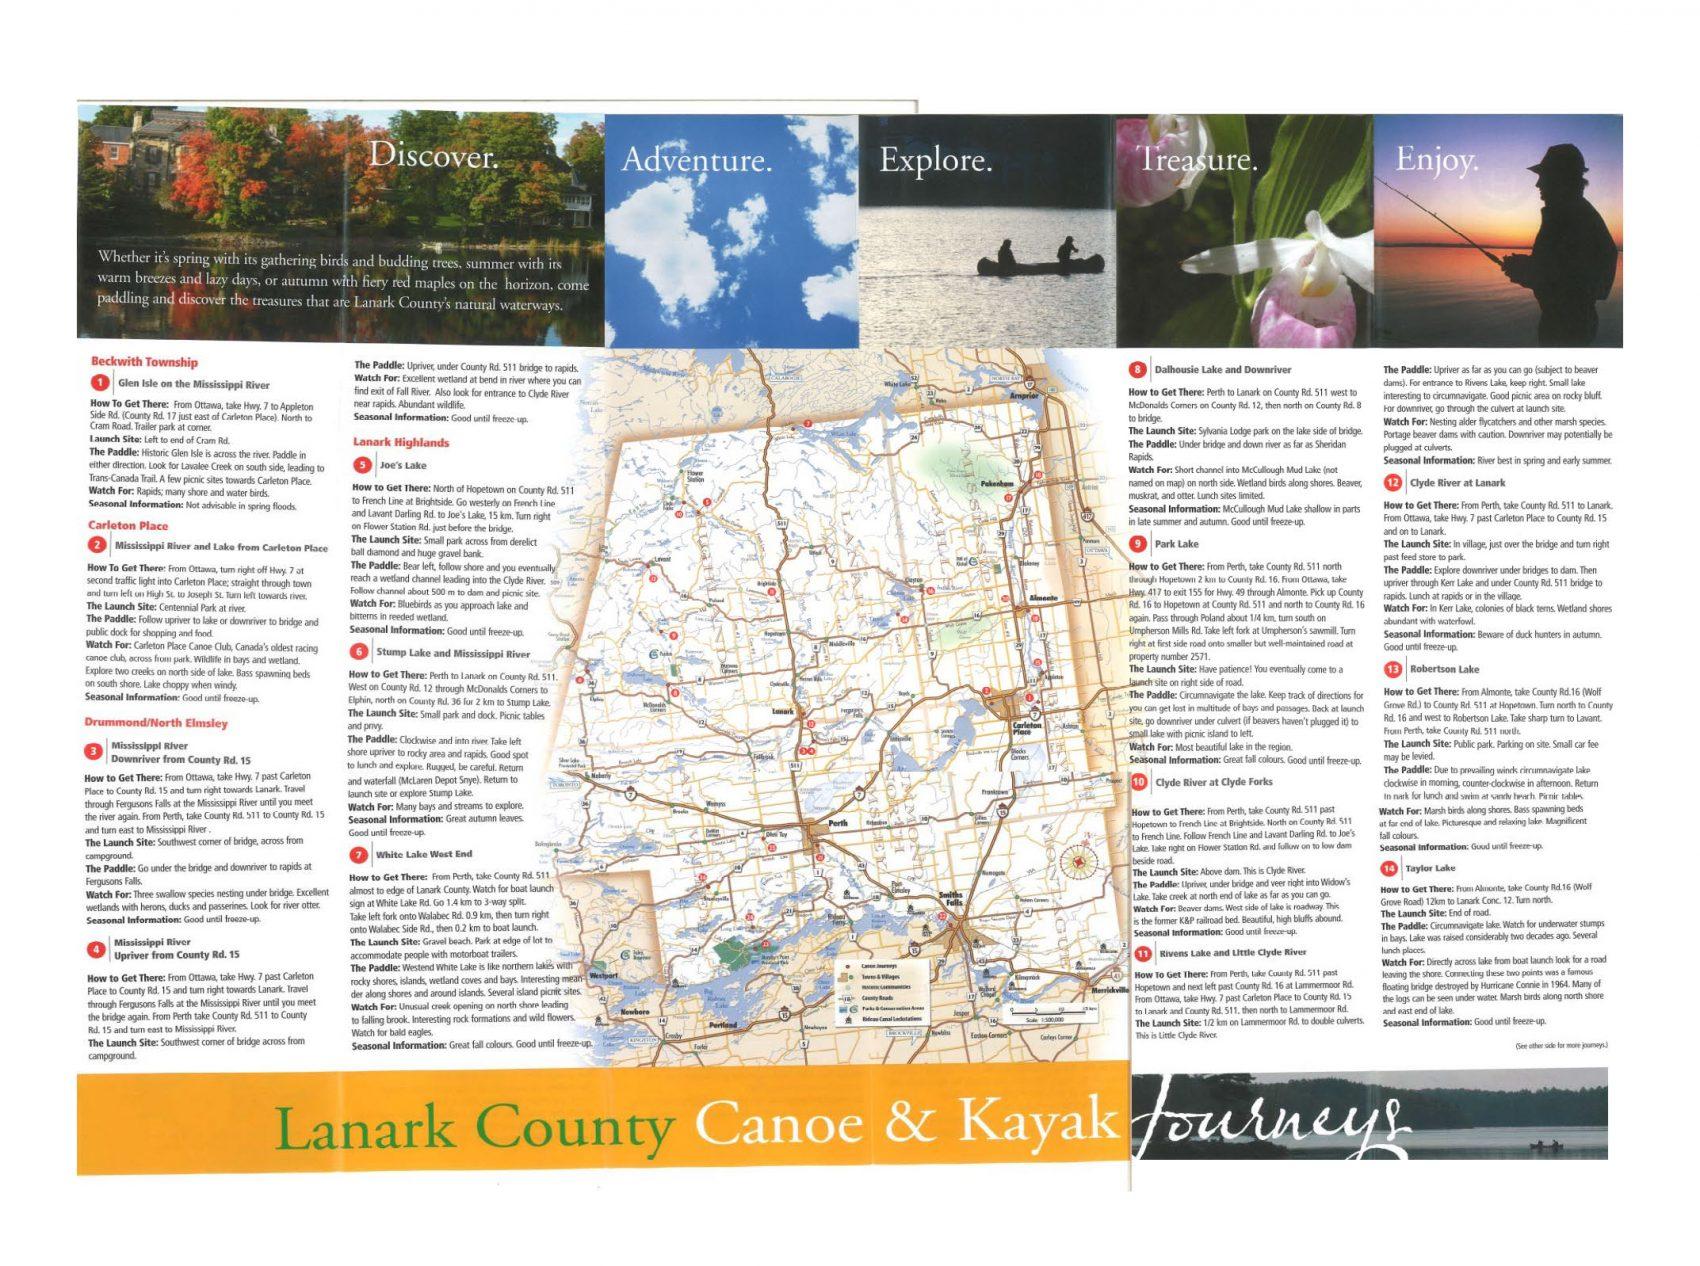 Canoe Kayak Journeys_page 1